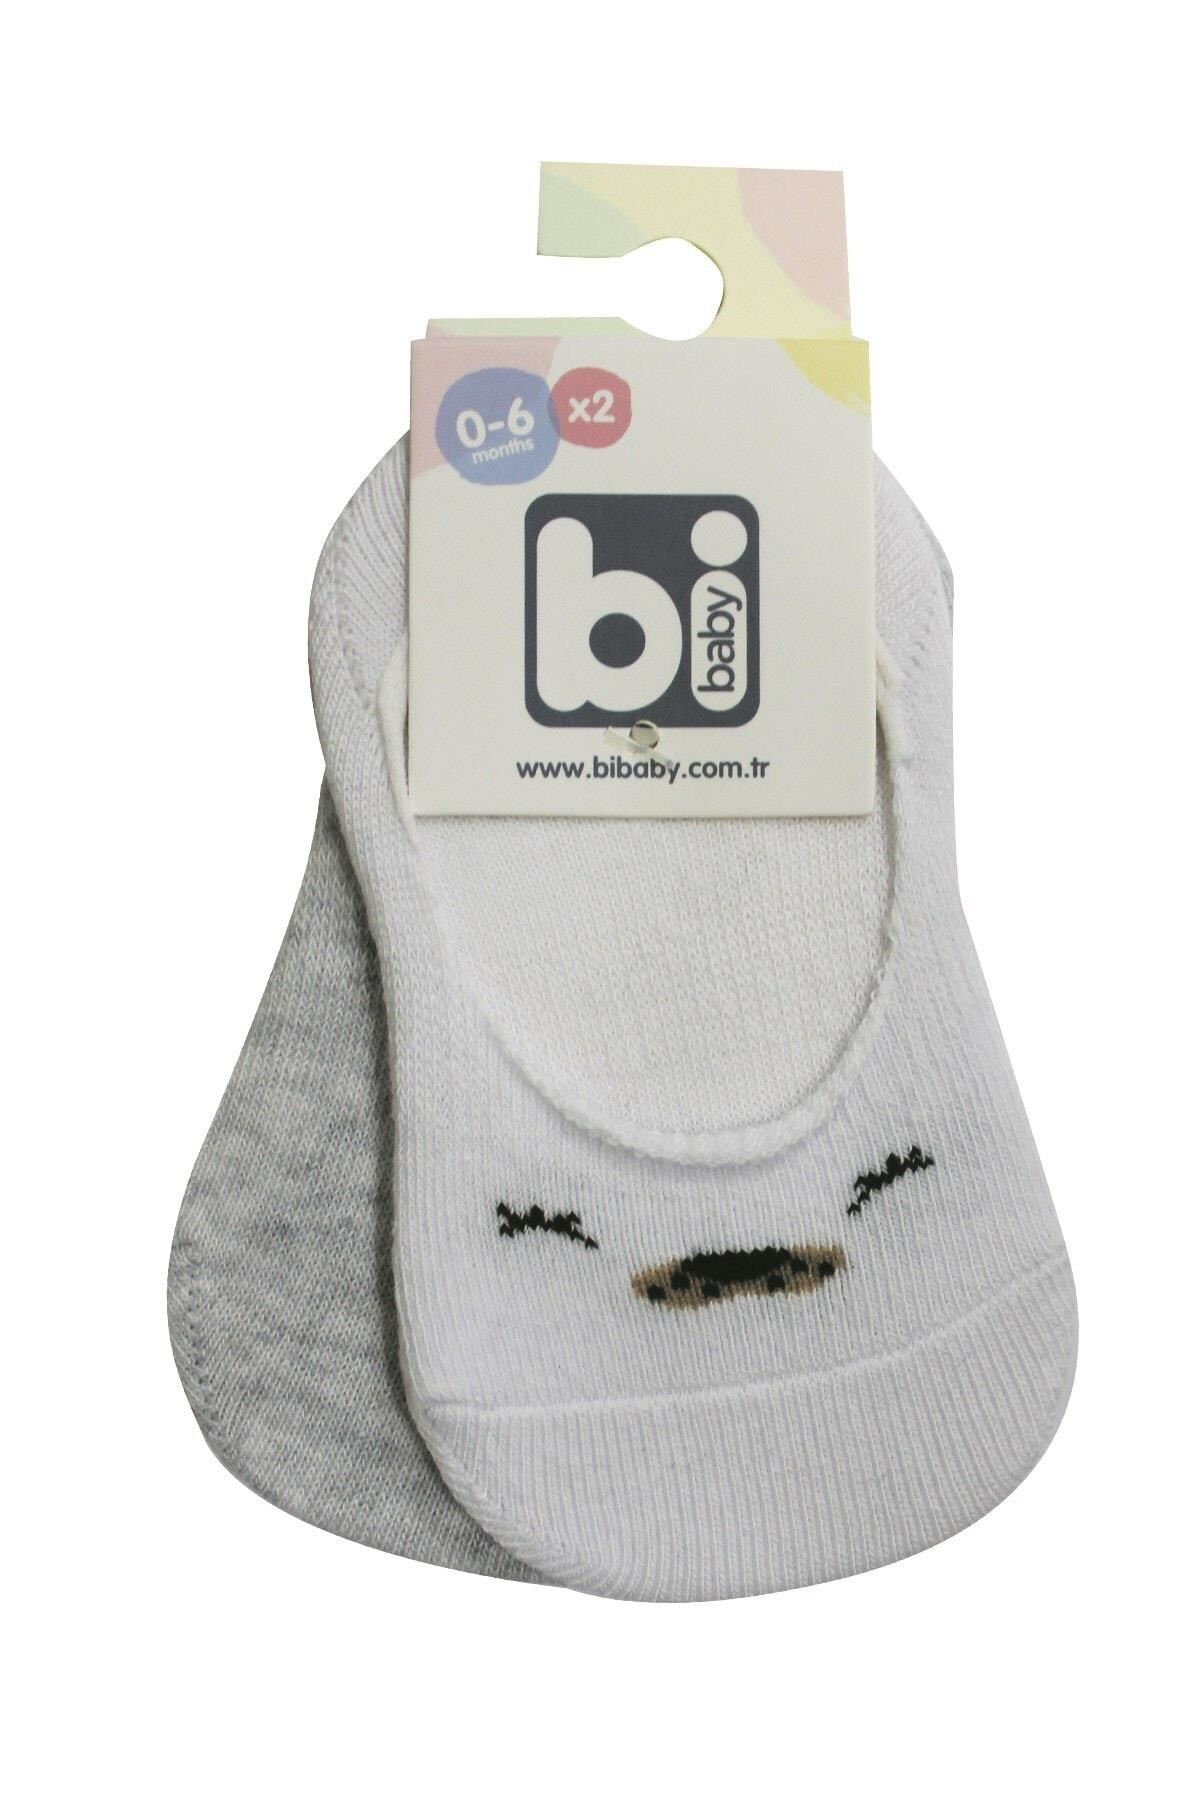 Bibaby Cute Face Erkek Babet Çorap 2Lİ 68353 Gri Beyaz